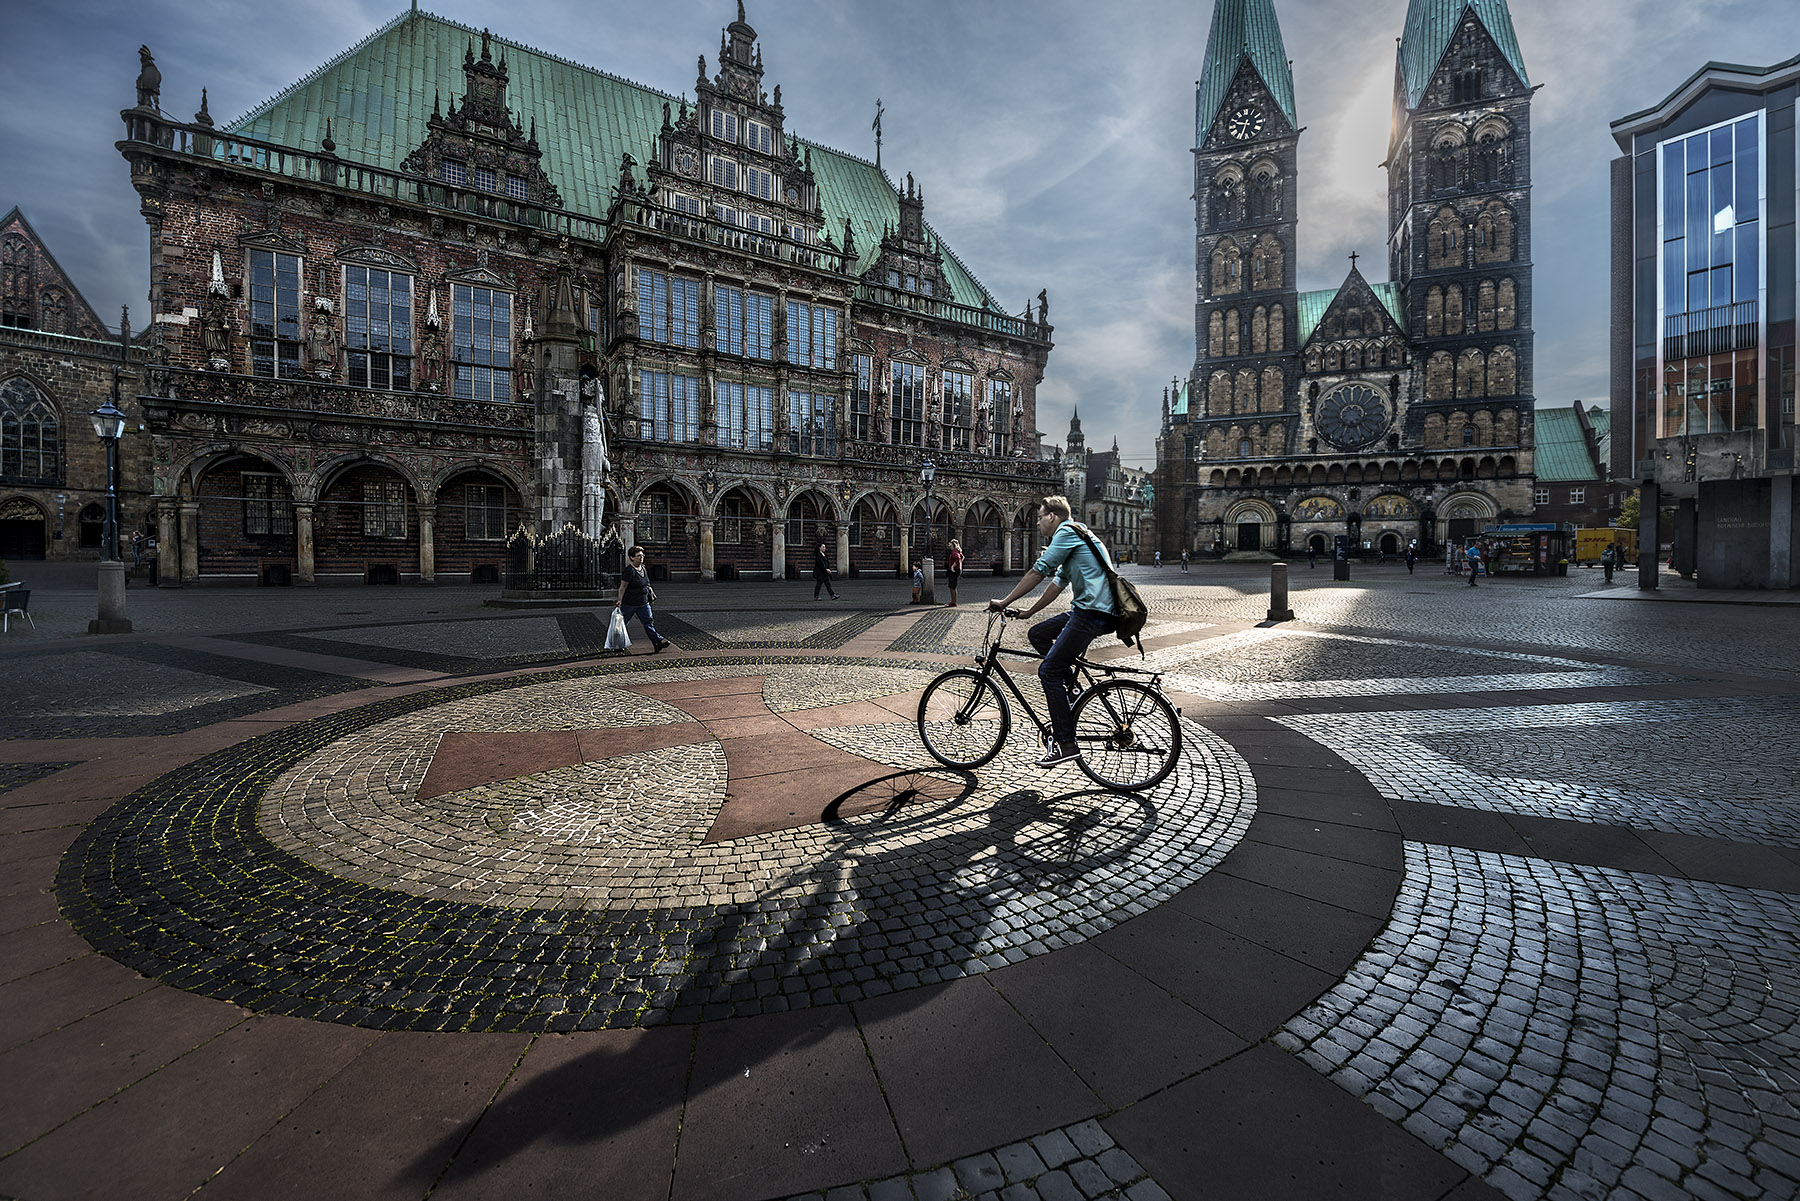 Crossing the light. Brema, Germany